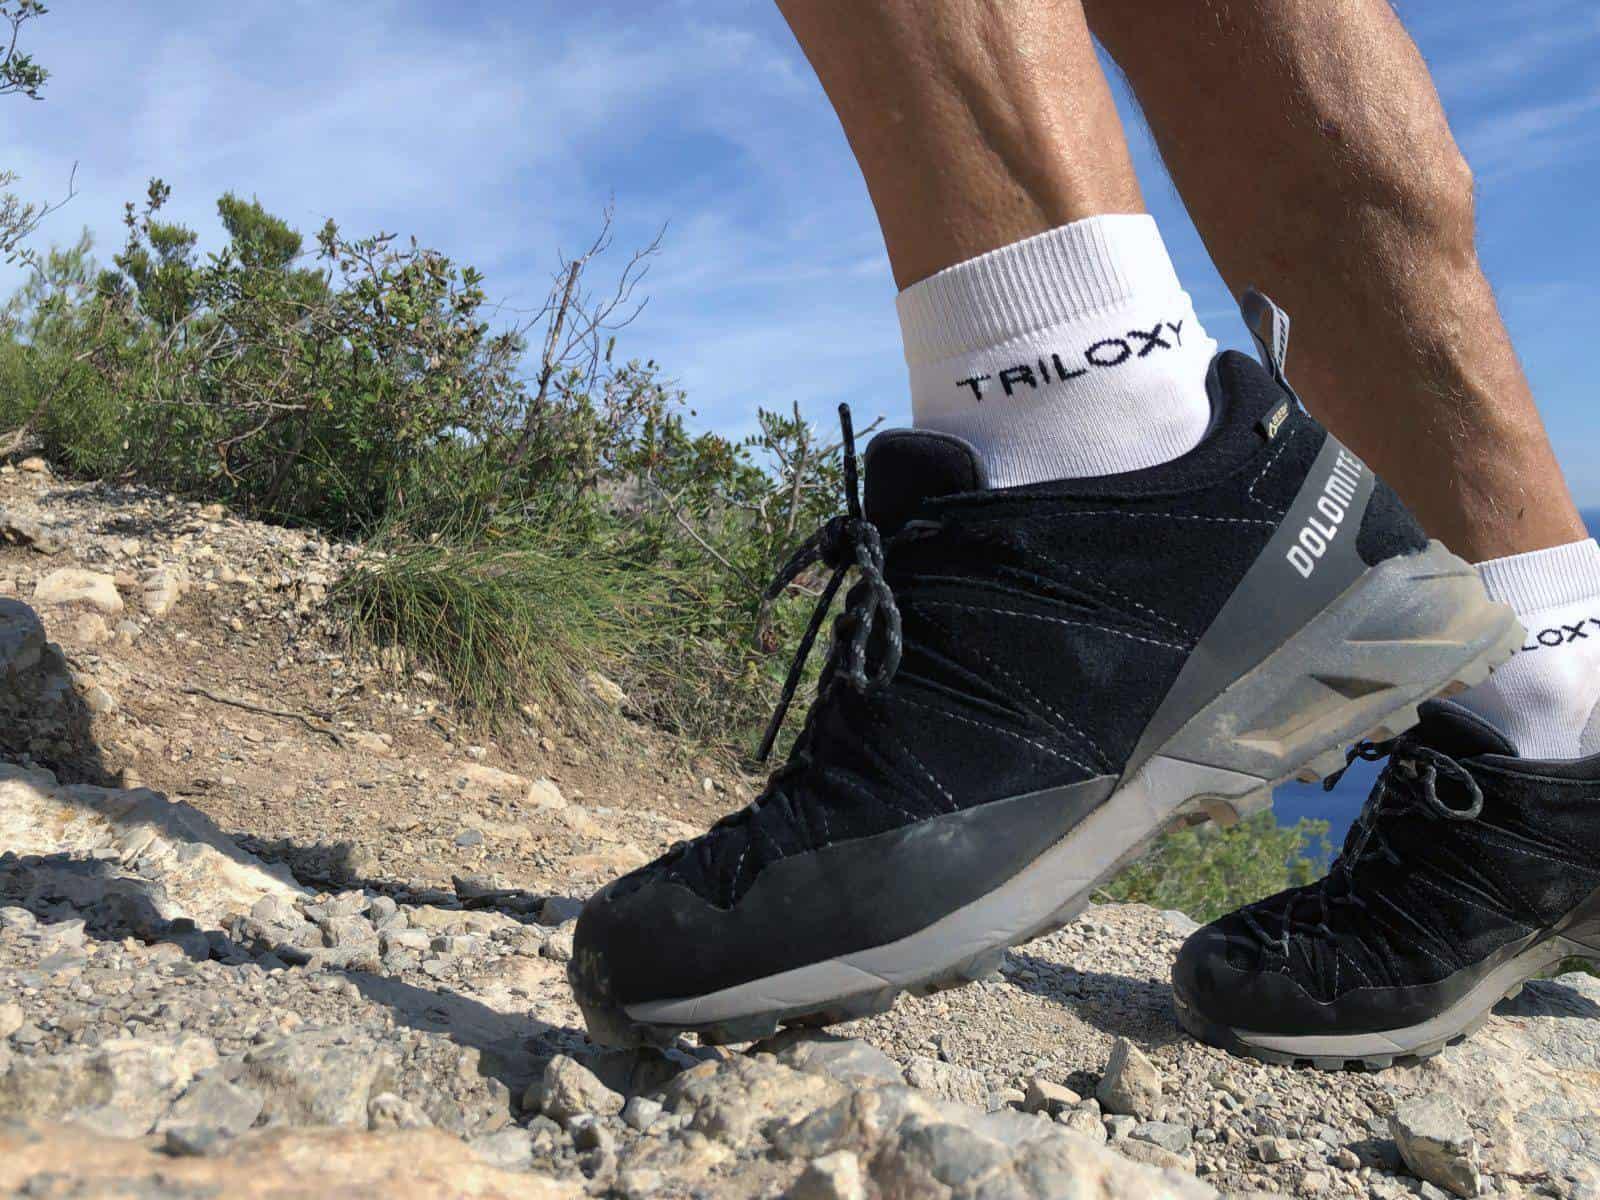 Dolomite Crodarossa Trek calzatura classica, elegante e affidabile